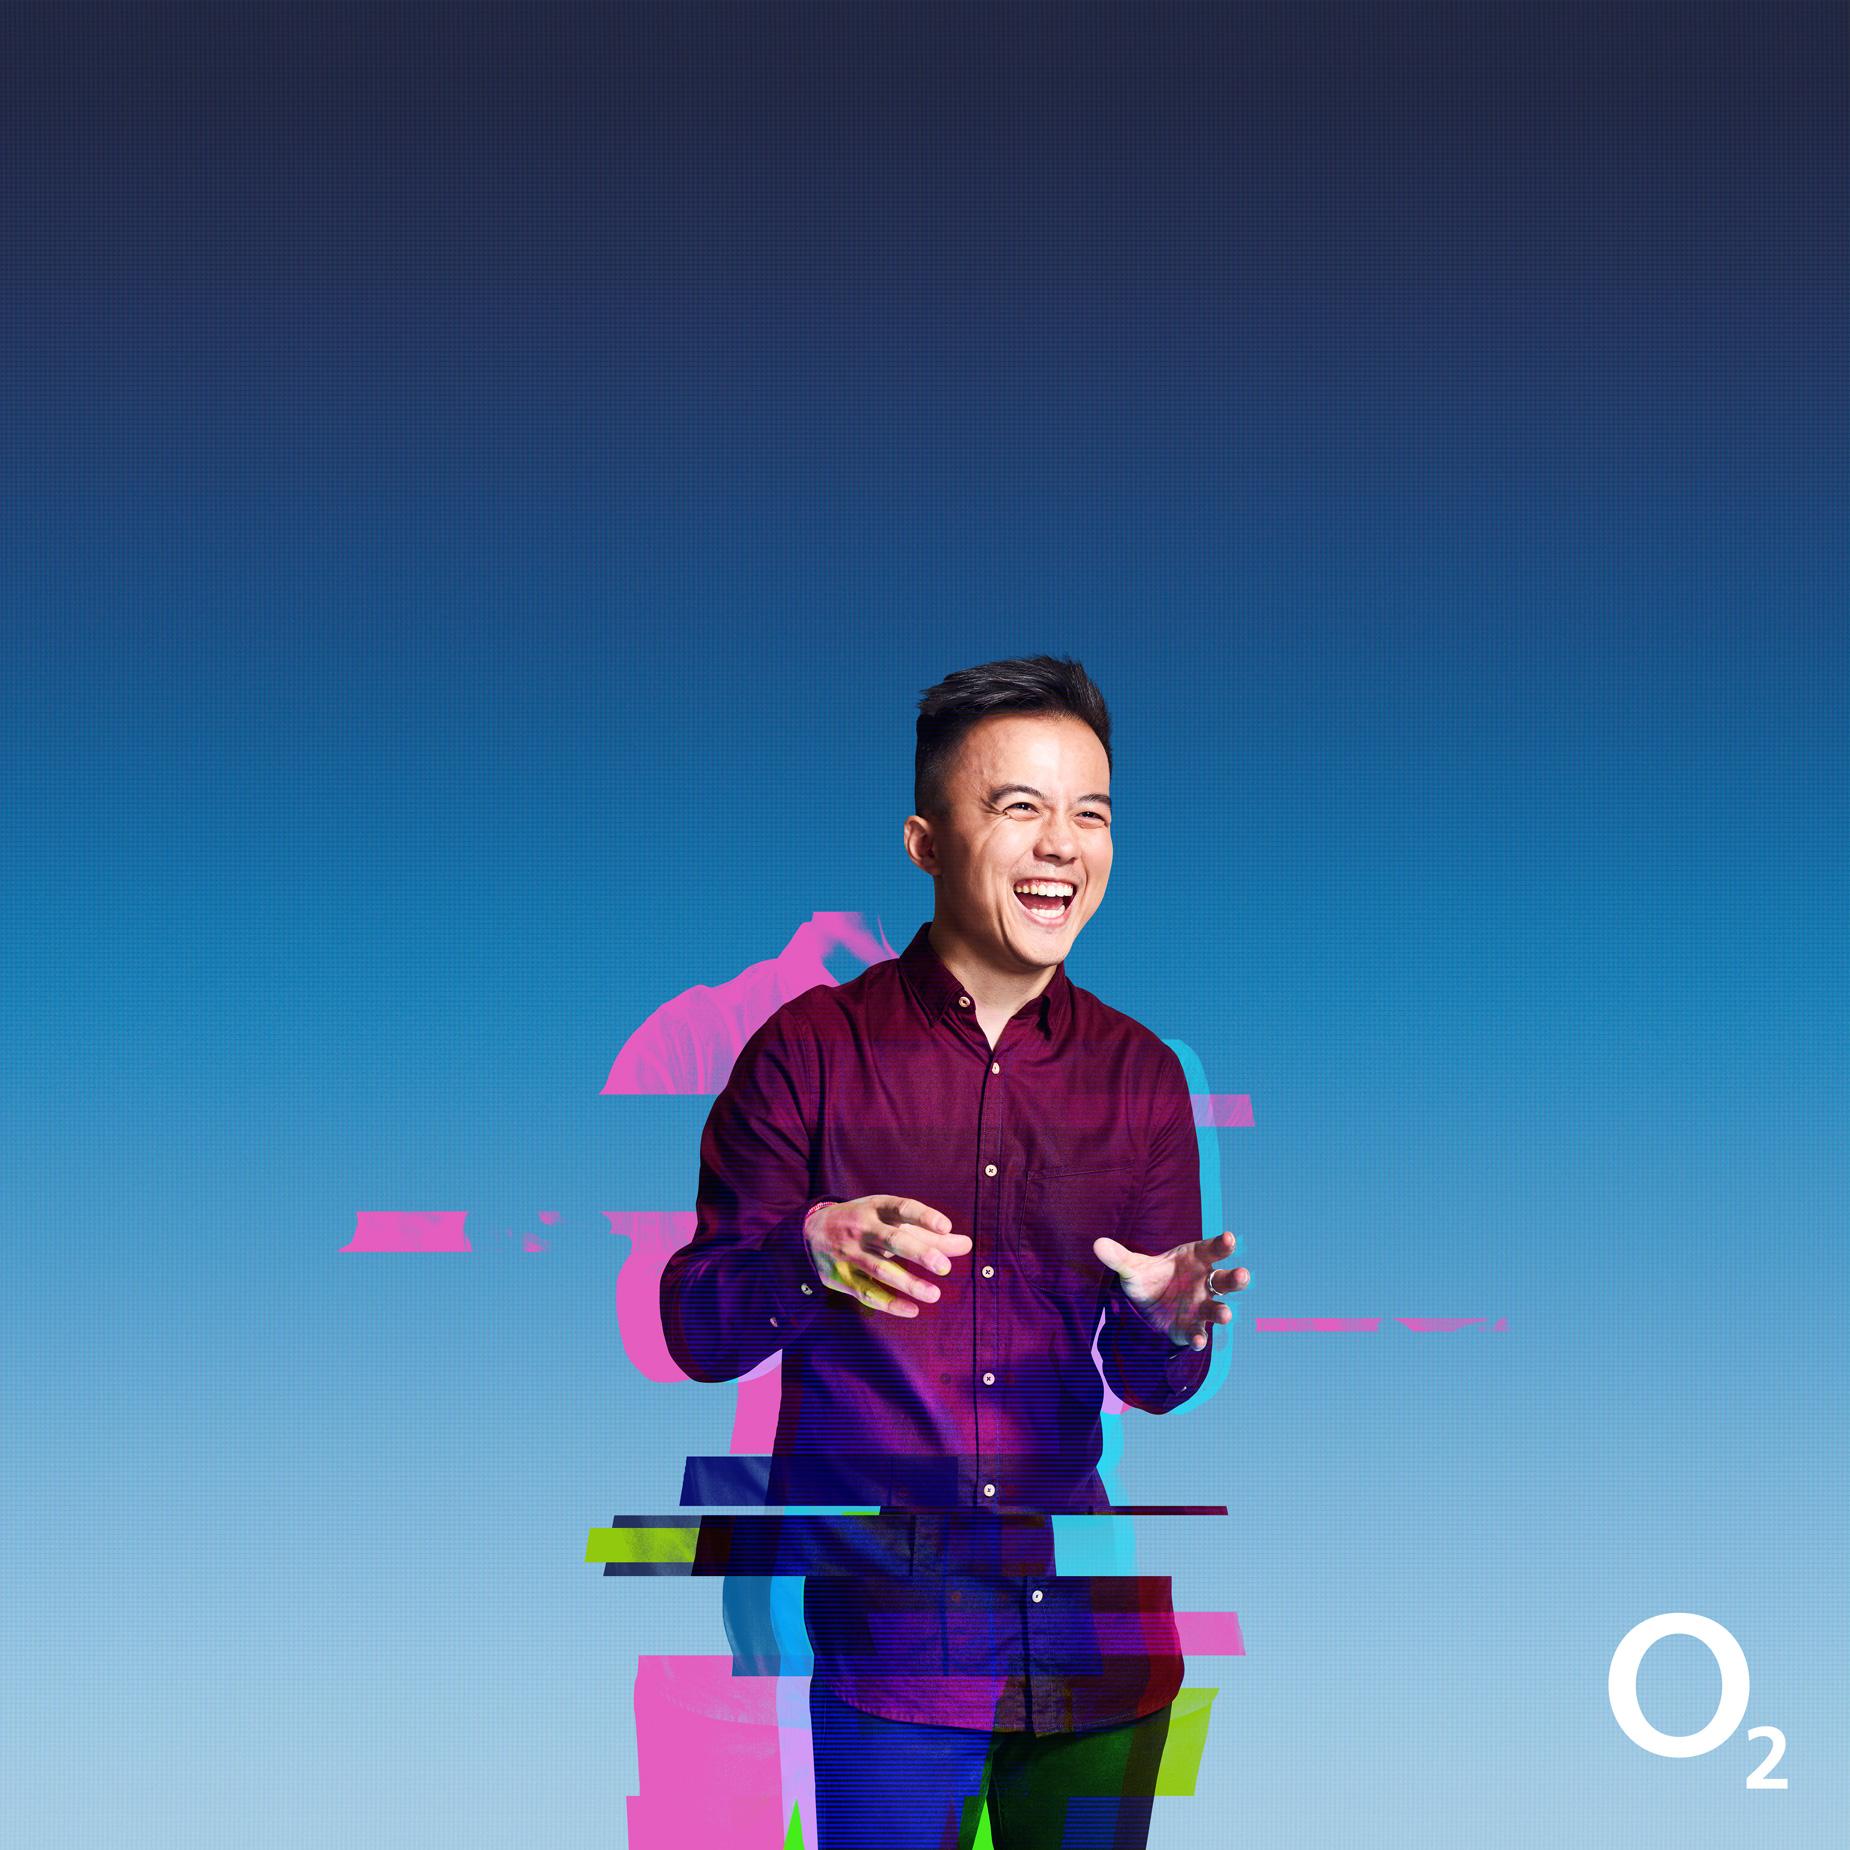 O2-Go-Think-Big-Adrian-Pang-1-Small-RGB